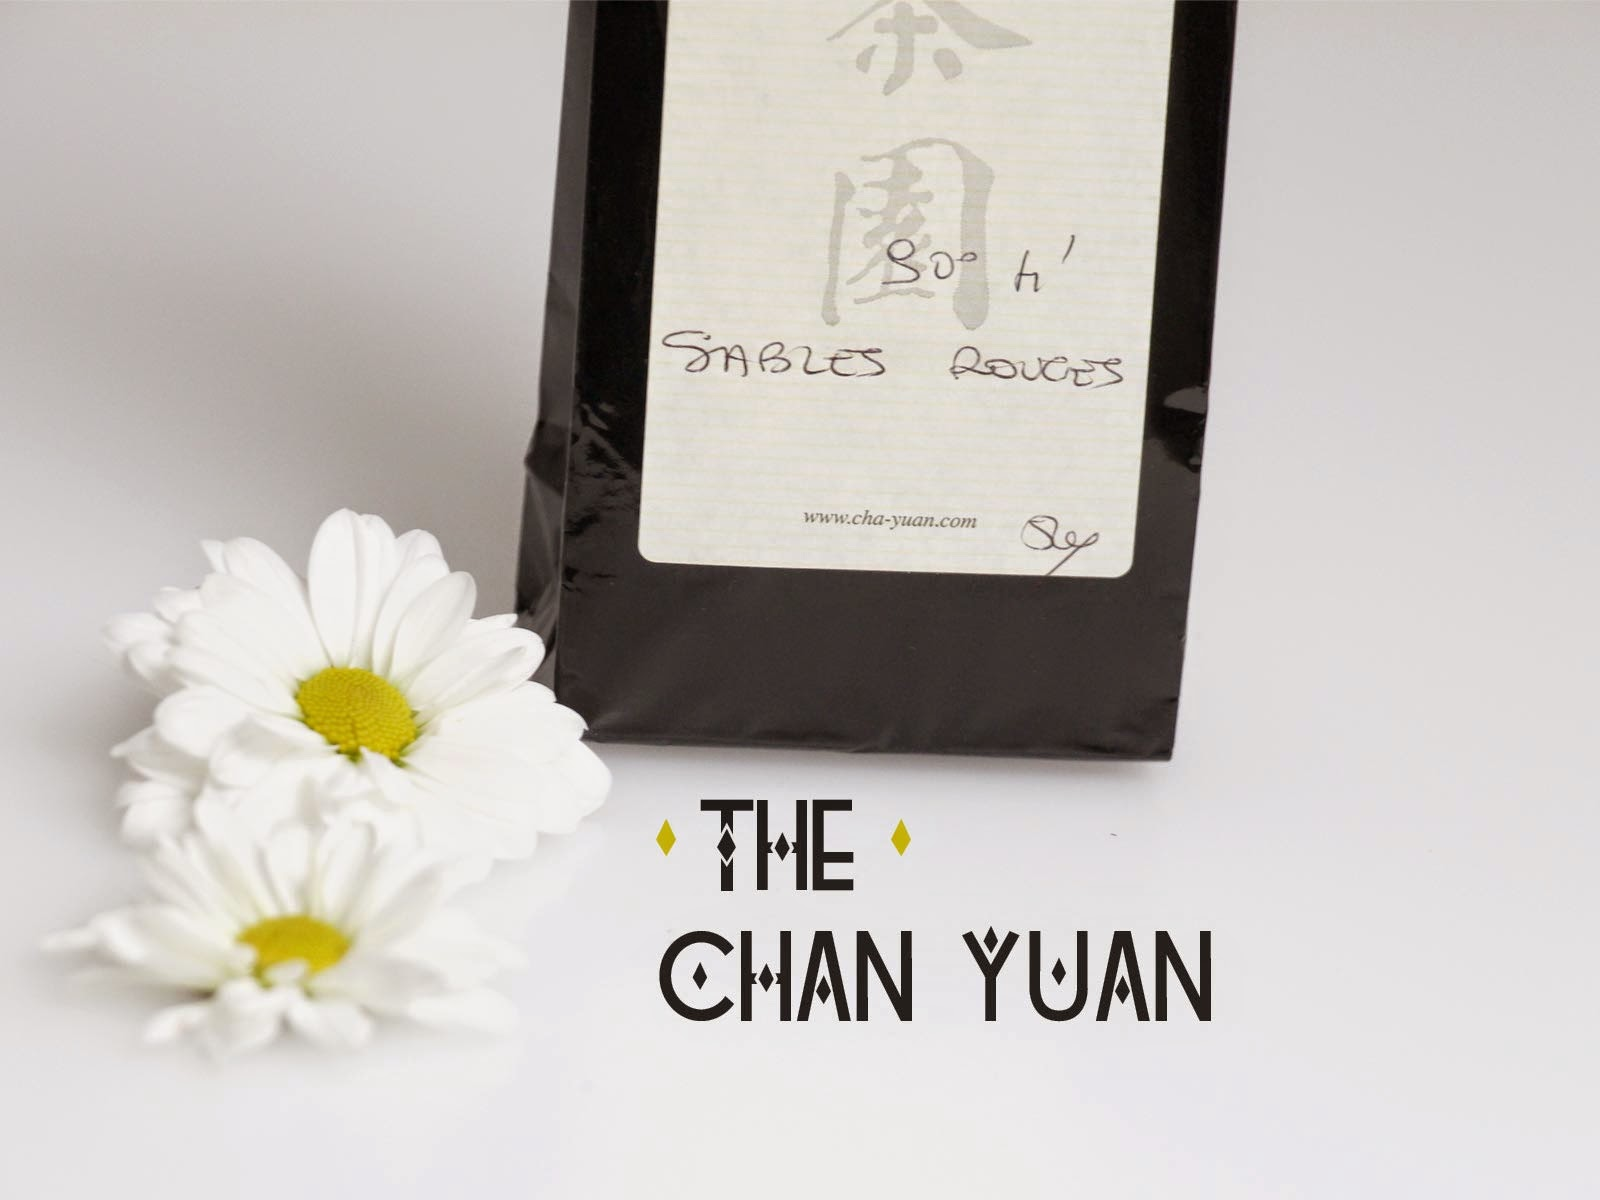 chanyuan